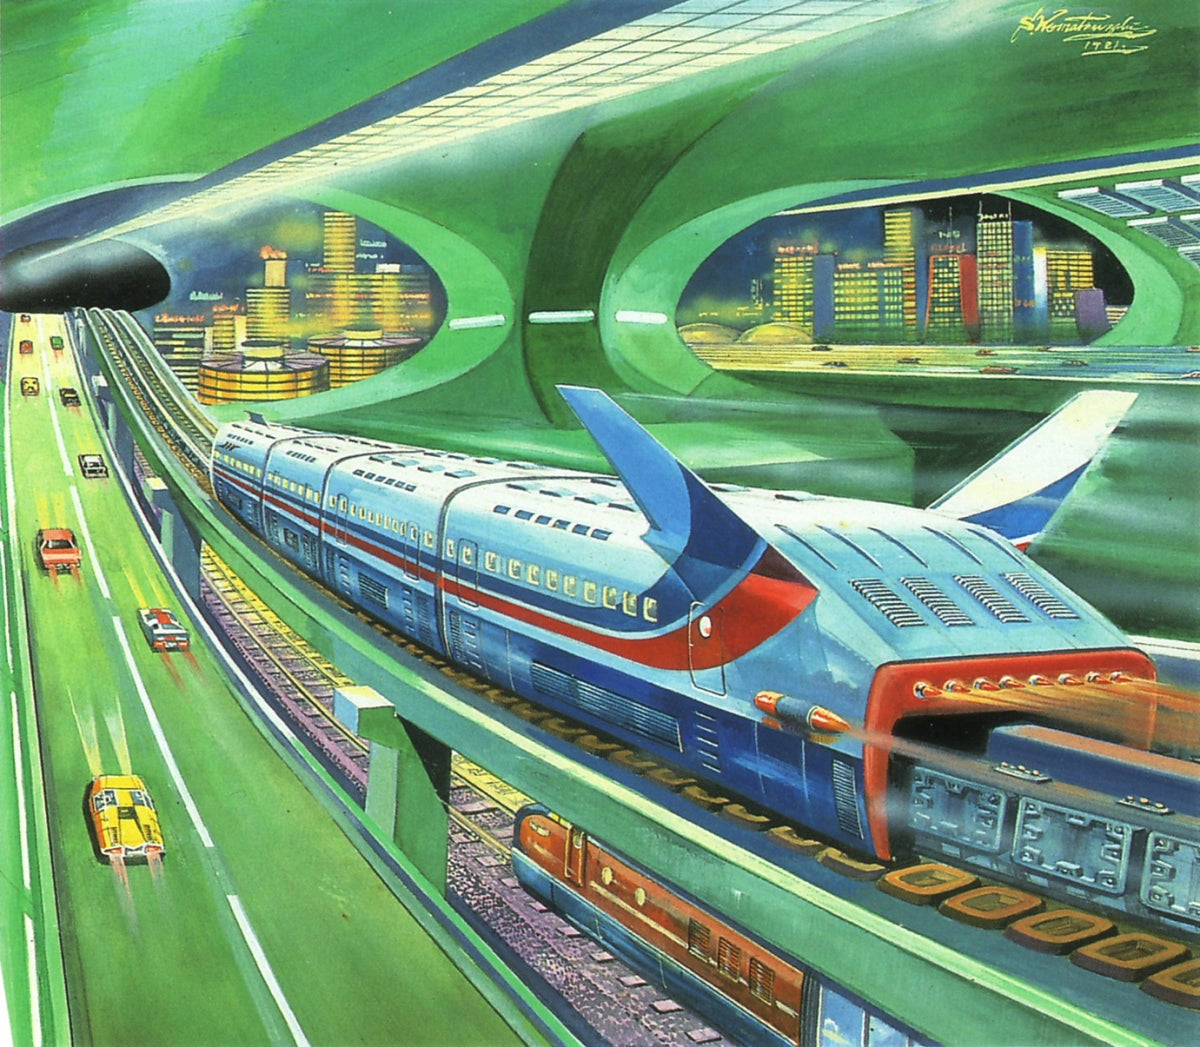 Shigeru Komatsuzaki's Beautiful 1960s Visions of the Future Pulled From Japanese Model Kits